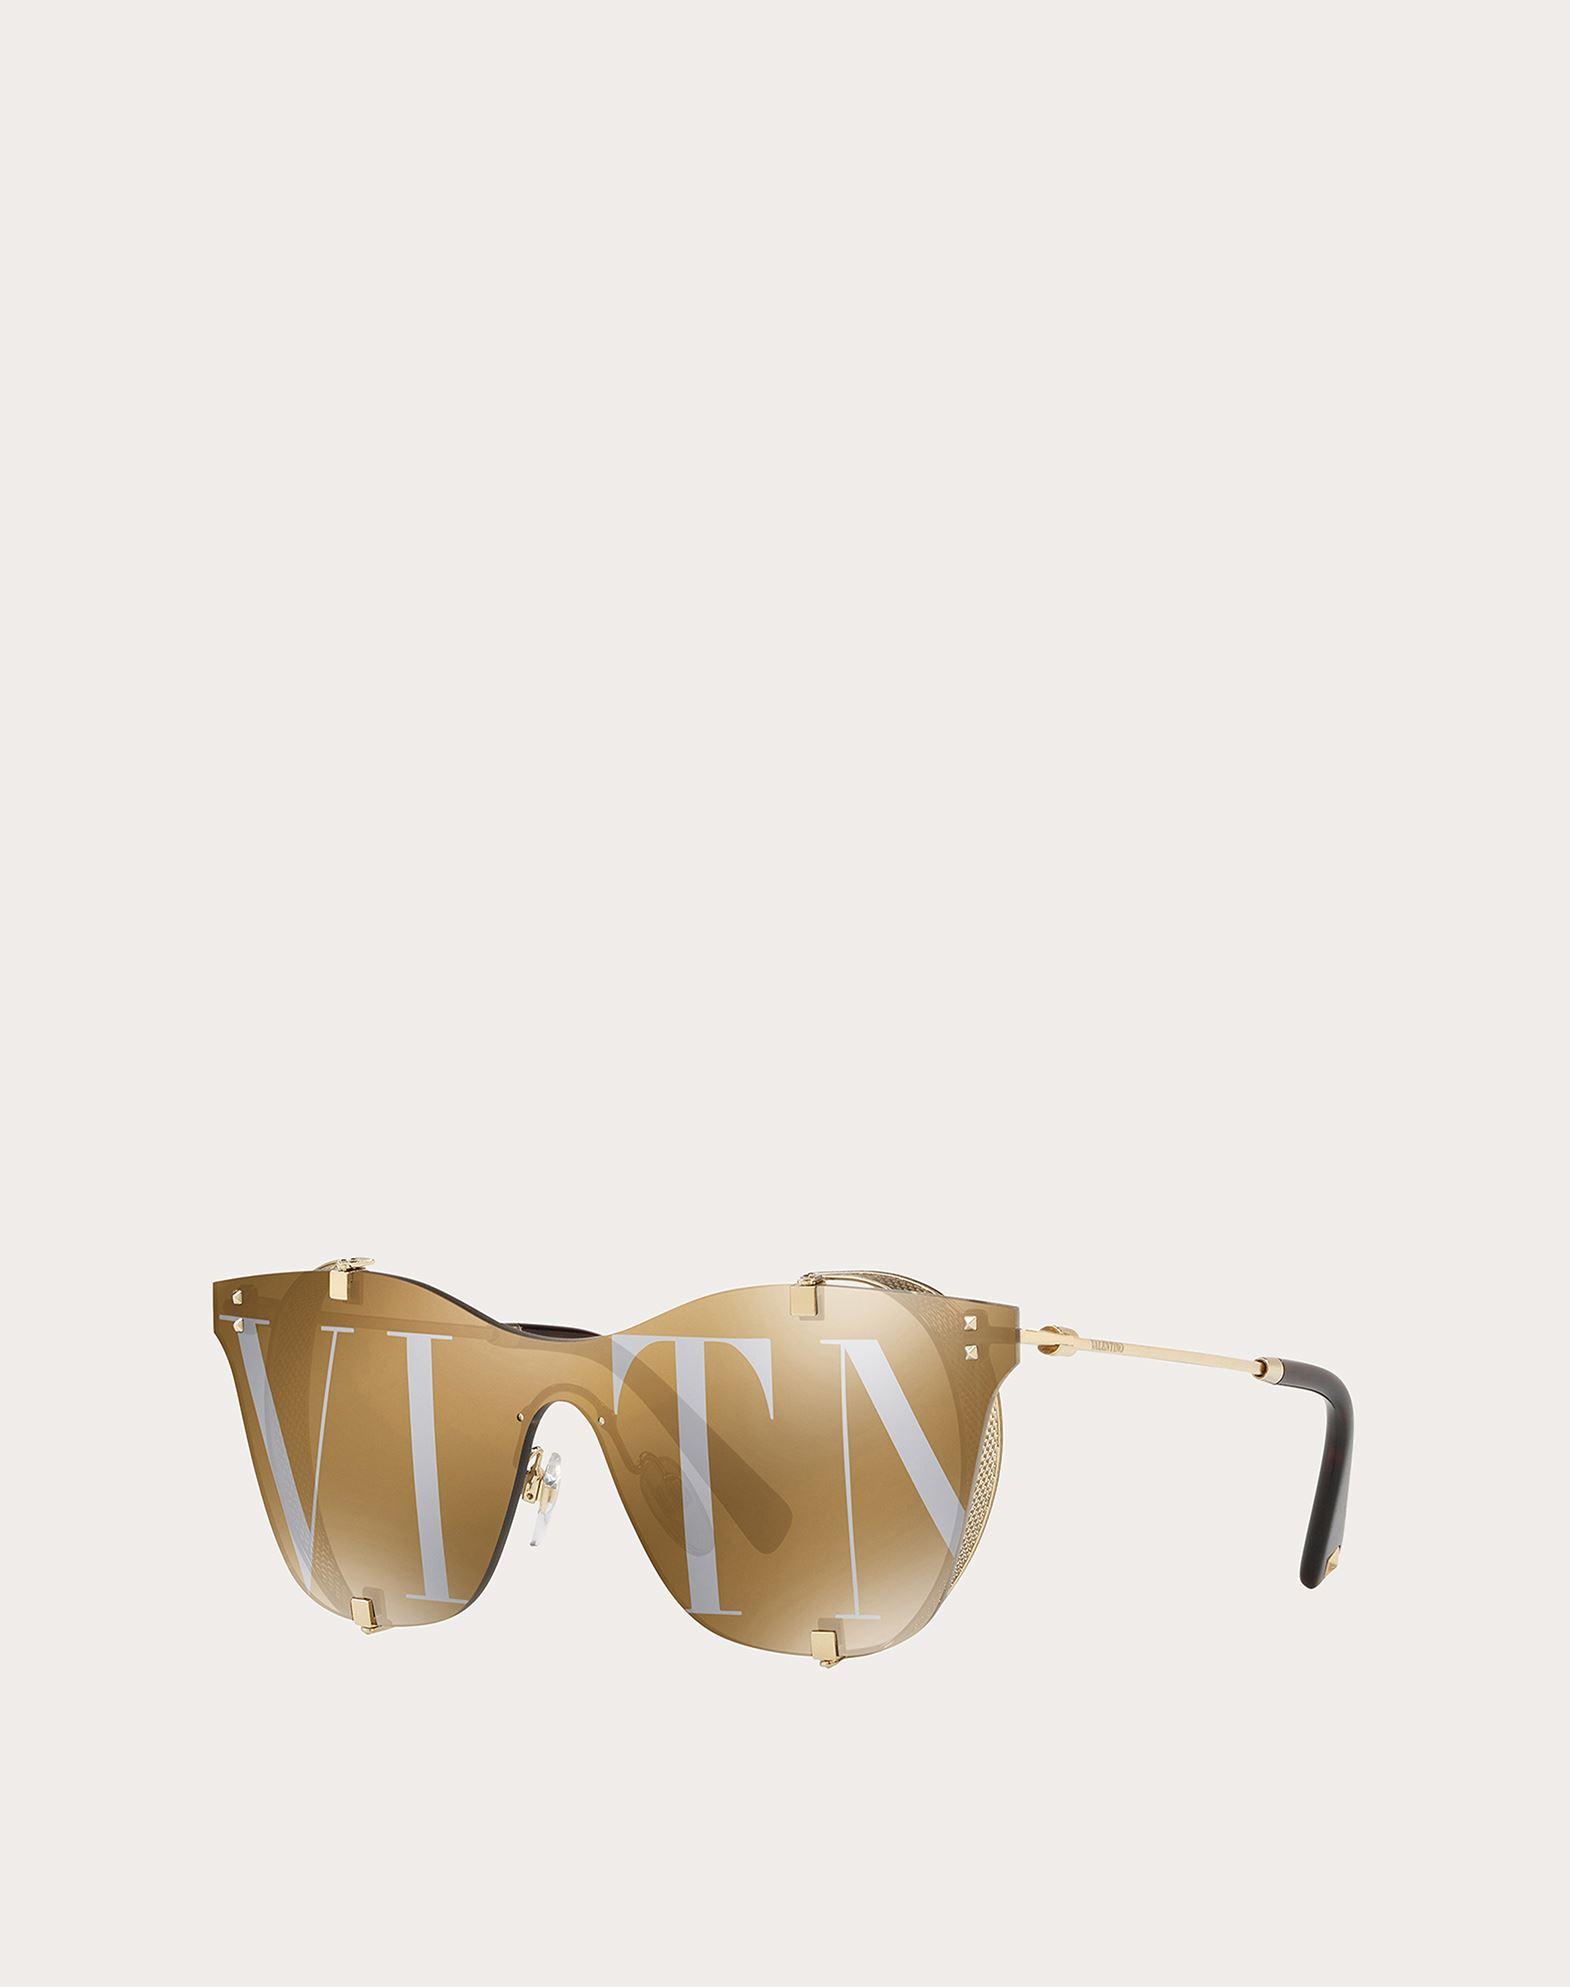 VALENTINO OCCHIALI VLTN Metal Sunglasses Sunglasses U r